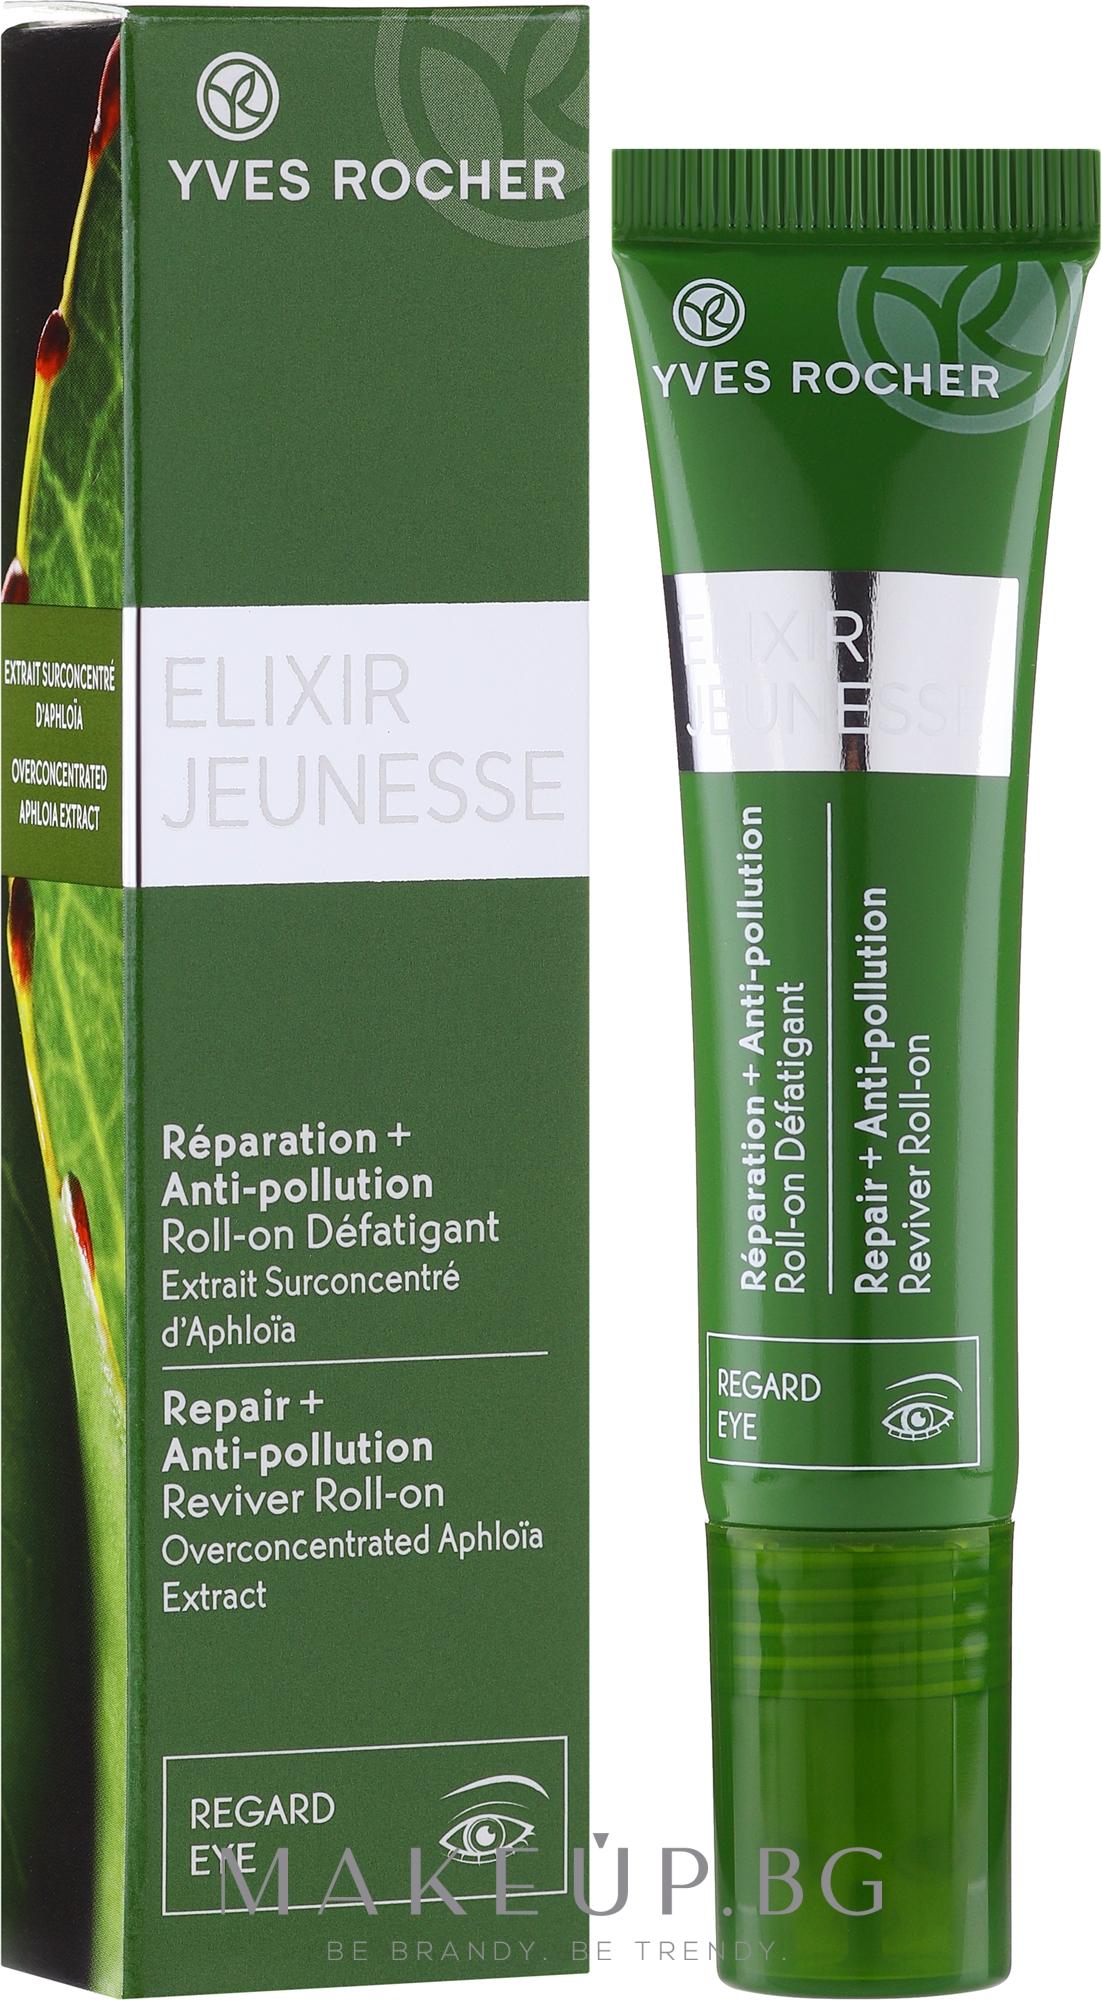 Възстановяващ околоочен крем рол-он - Yves Rocher Elixir Jeunesse Anti-pollution Reviving Roll-on — снимка 15 ml